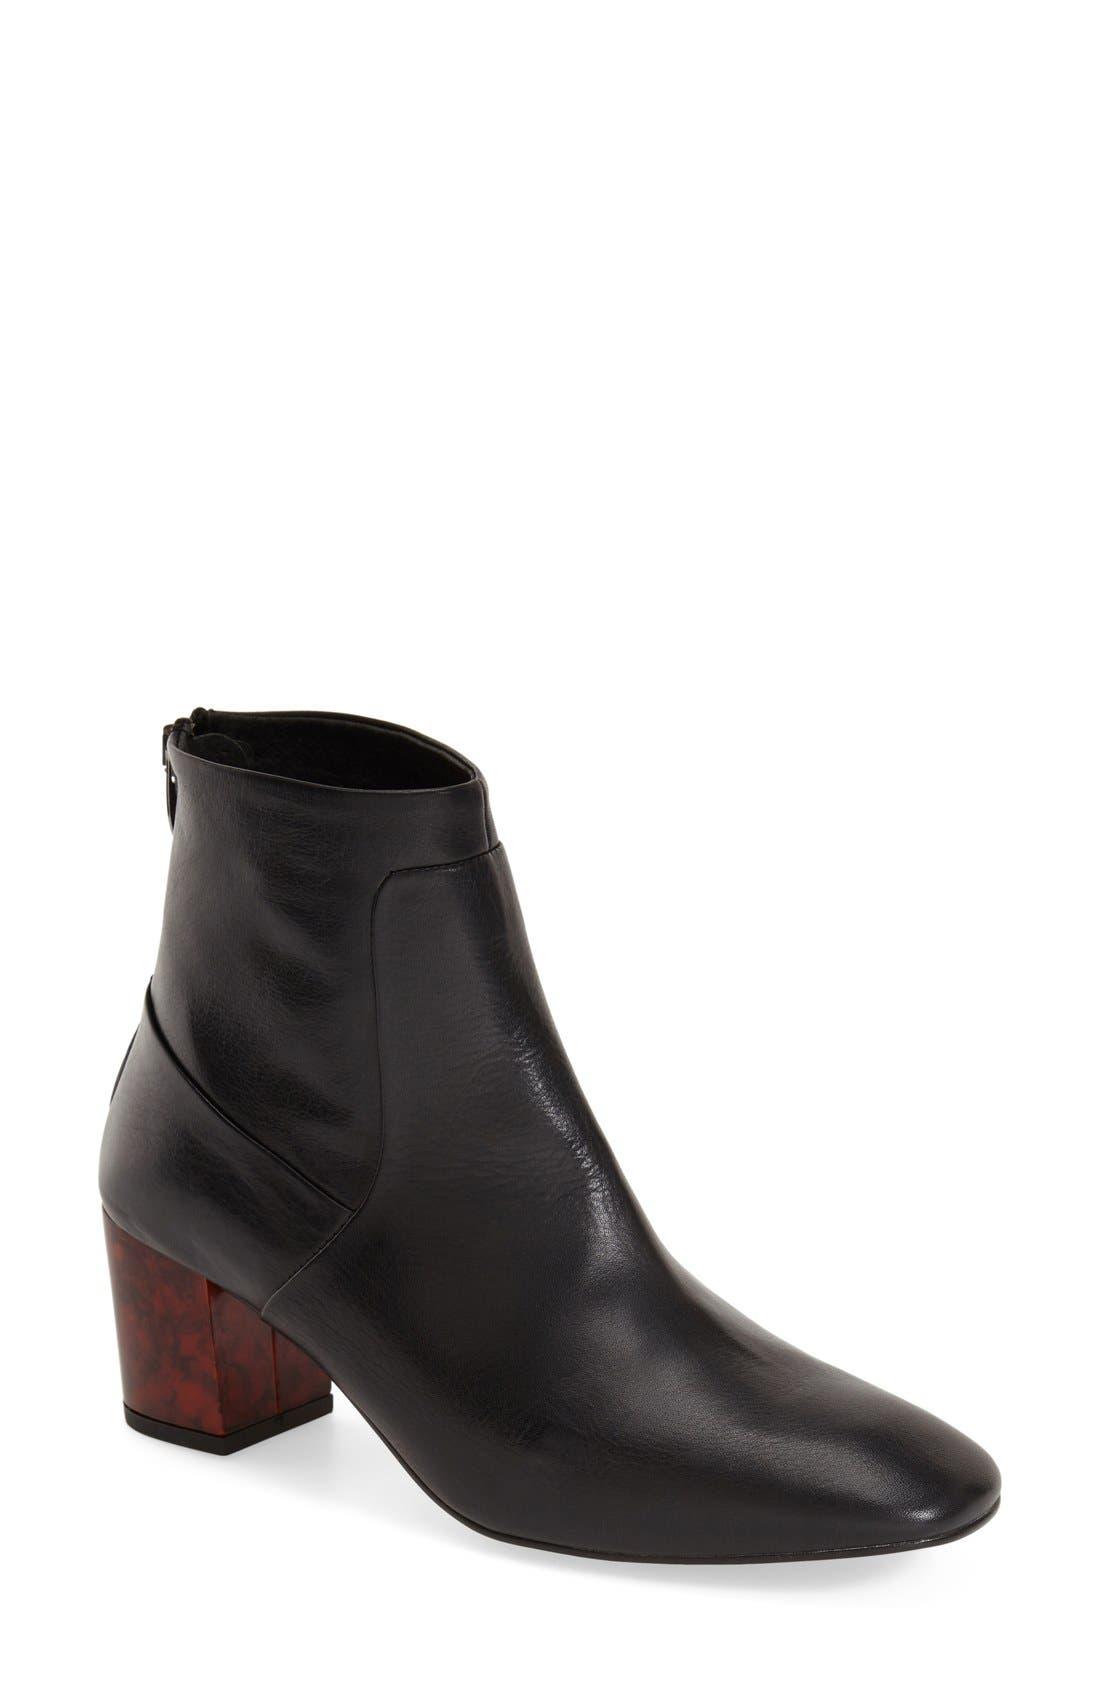 Main Image - Topshop 'Mistic'  Boot (Women)